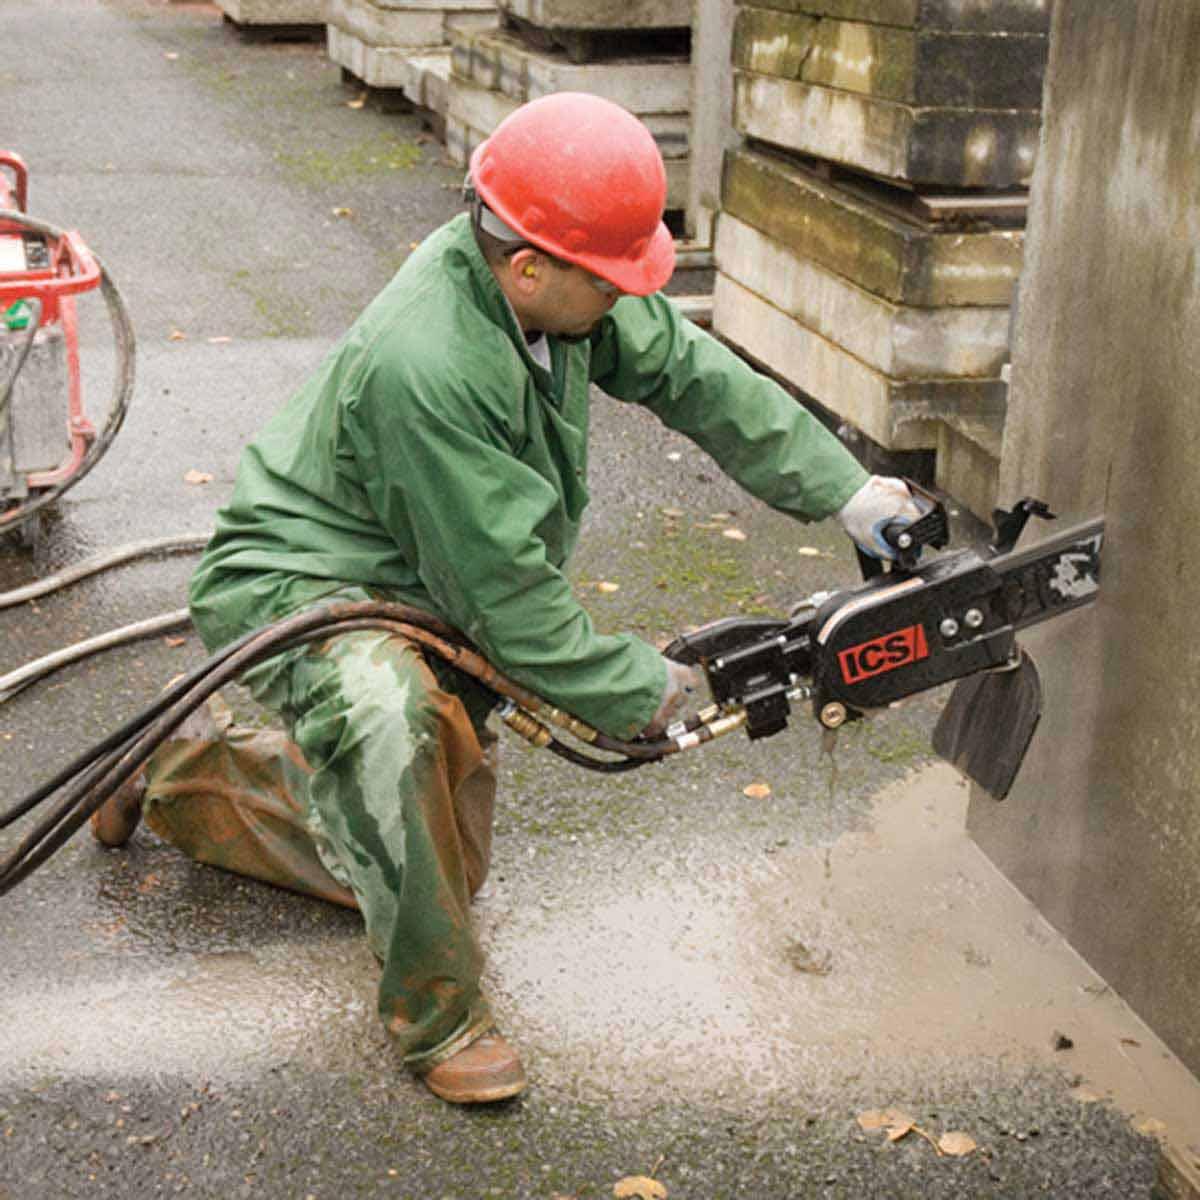 ICS 890F4 Hydraulic Concrete saw